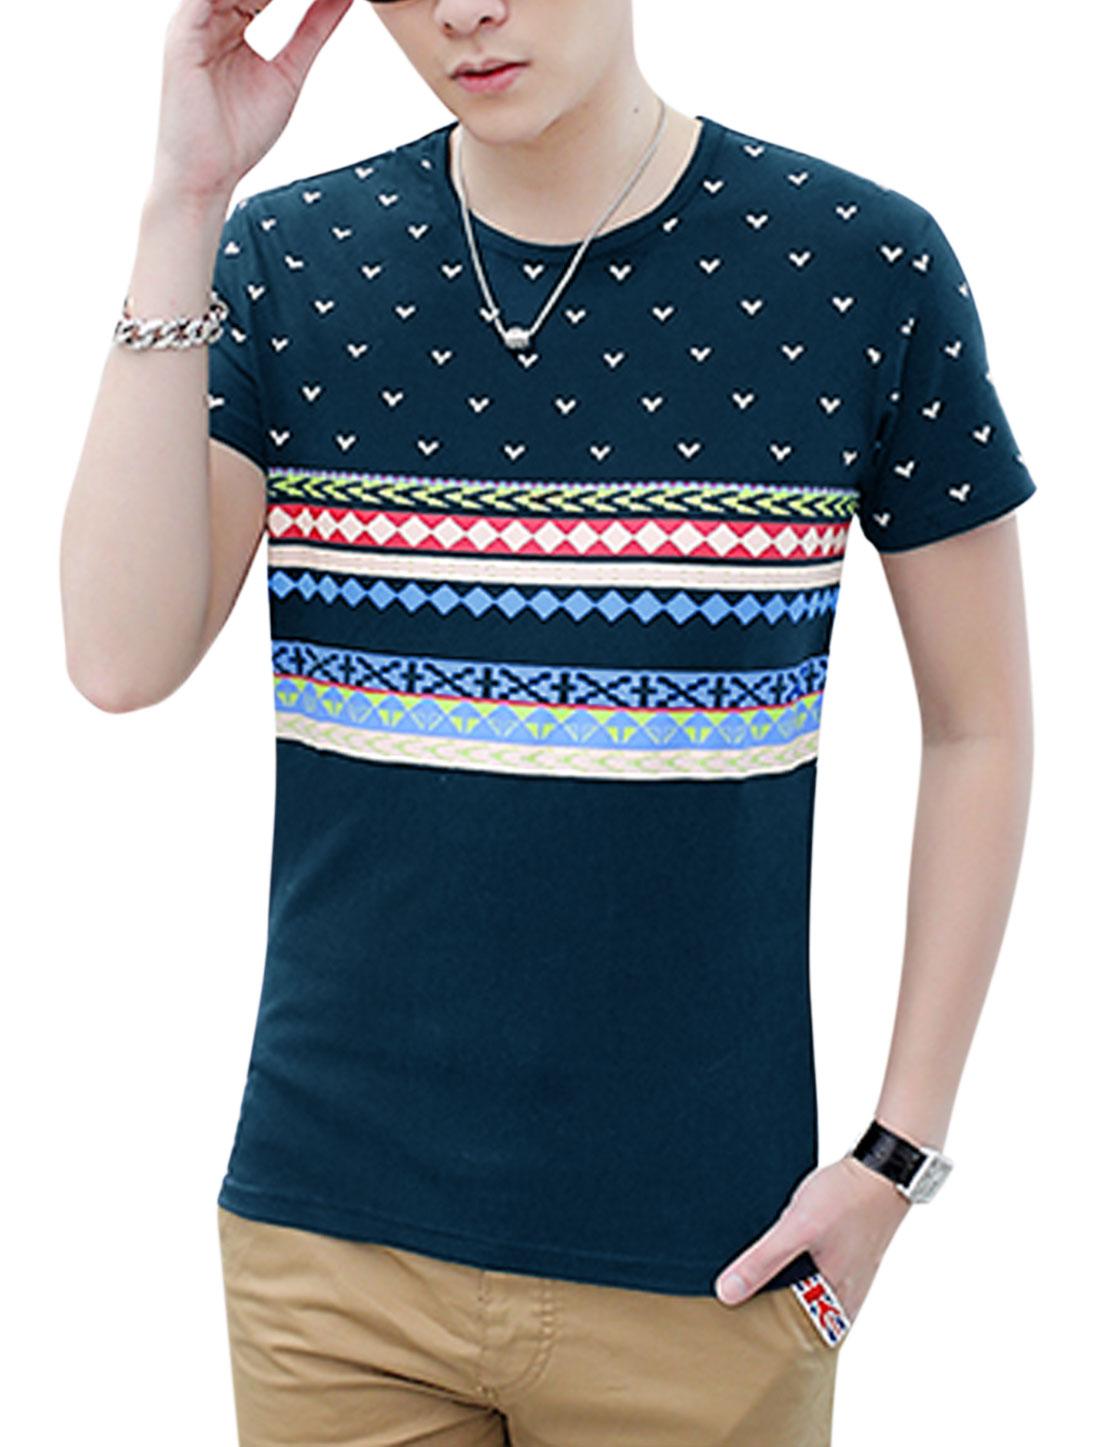 Men Short Sleeve Geometric Novelty Prints Slim Fit T-Shirt Navy Blue M